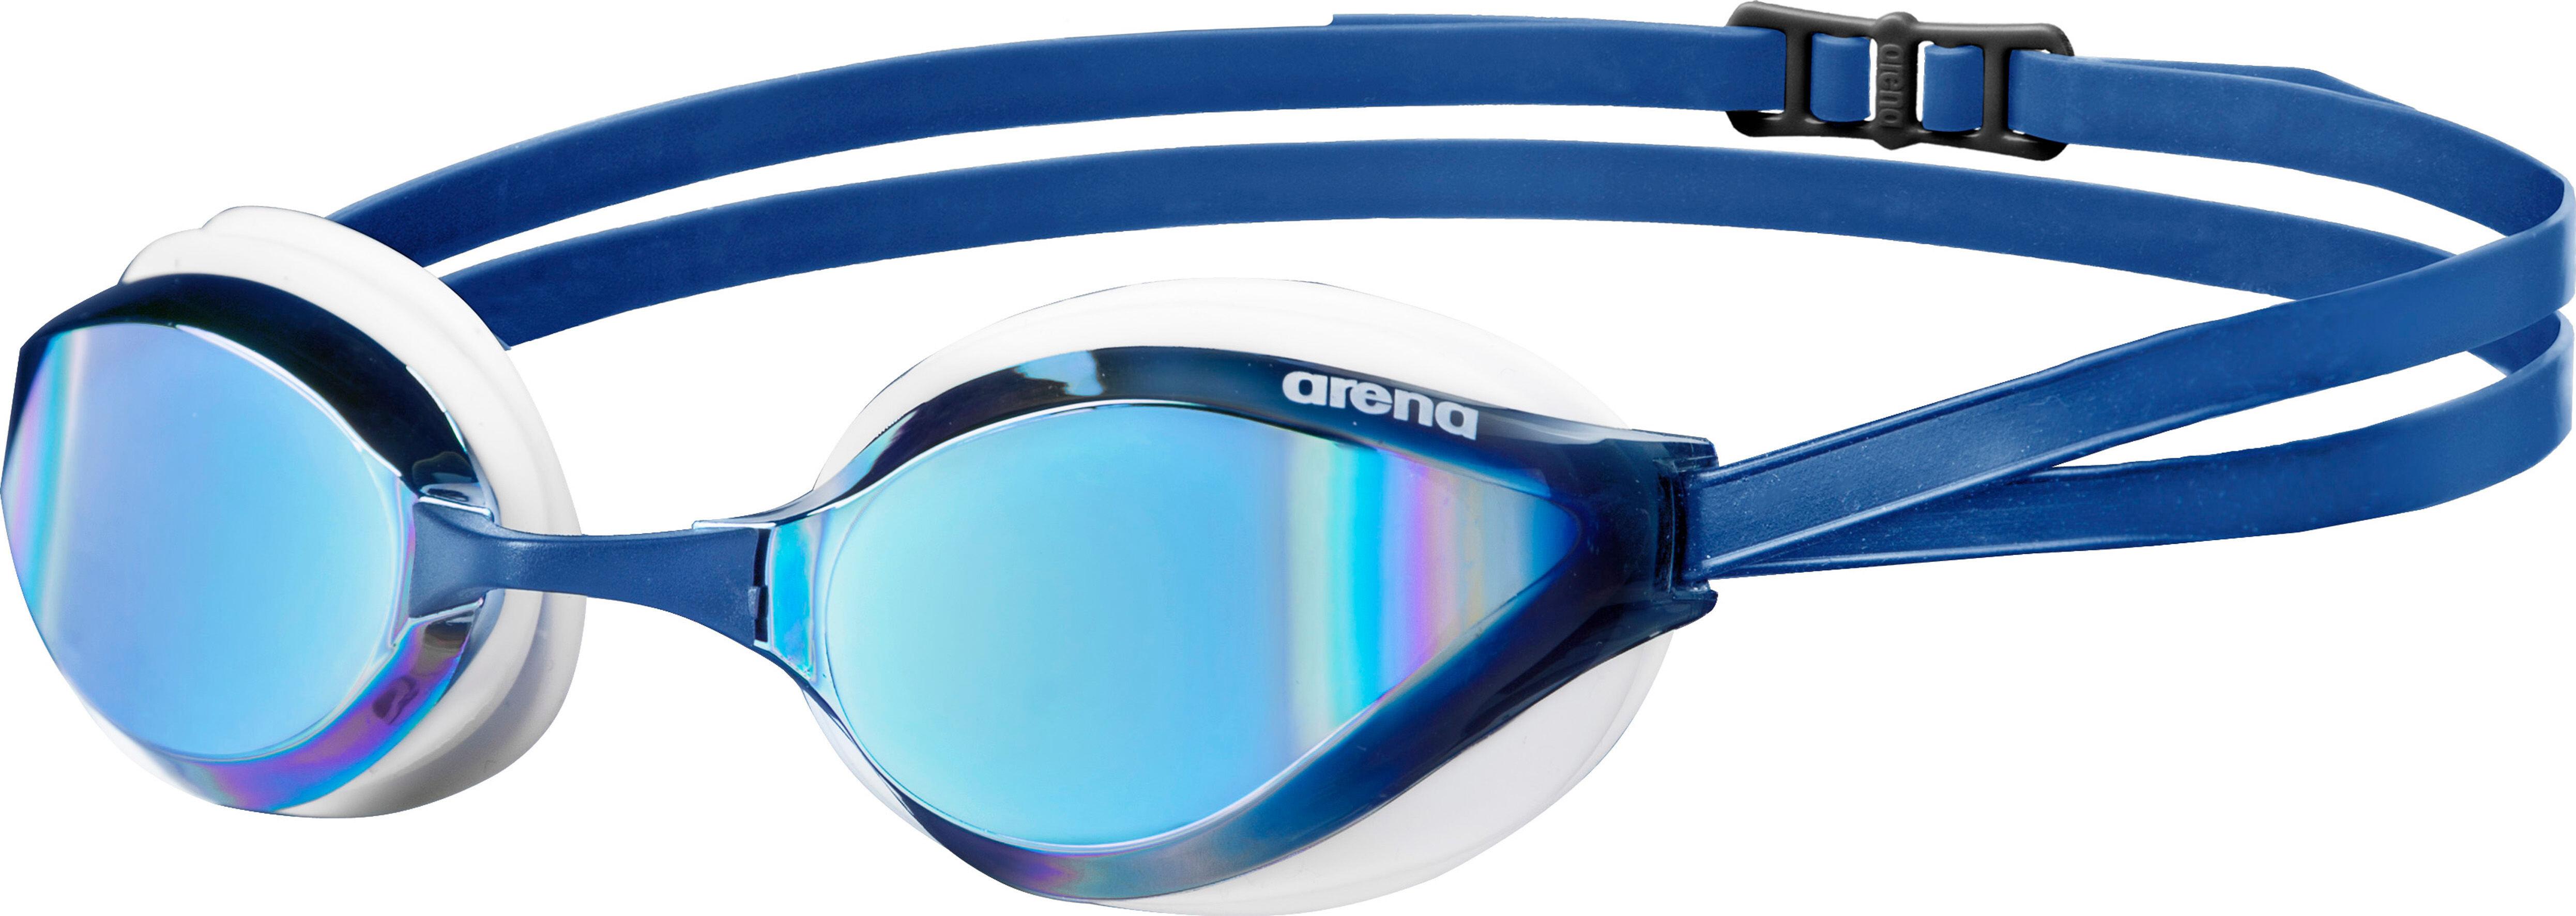 arena Python Mirror - Gafas de natación - azul  b3aca967df1